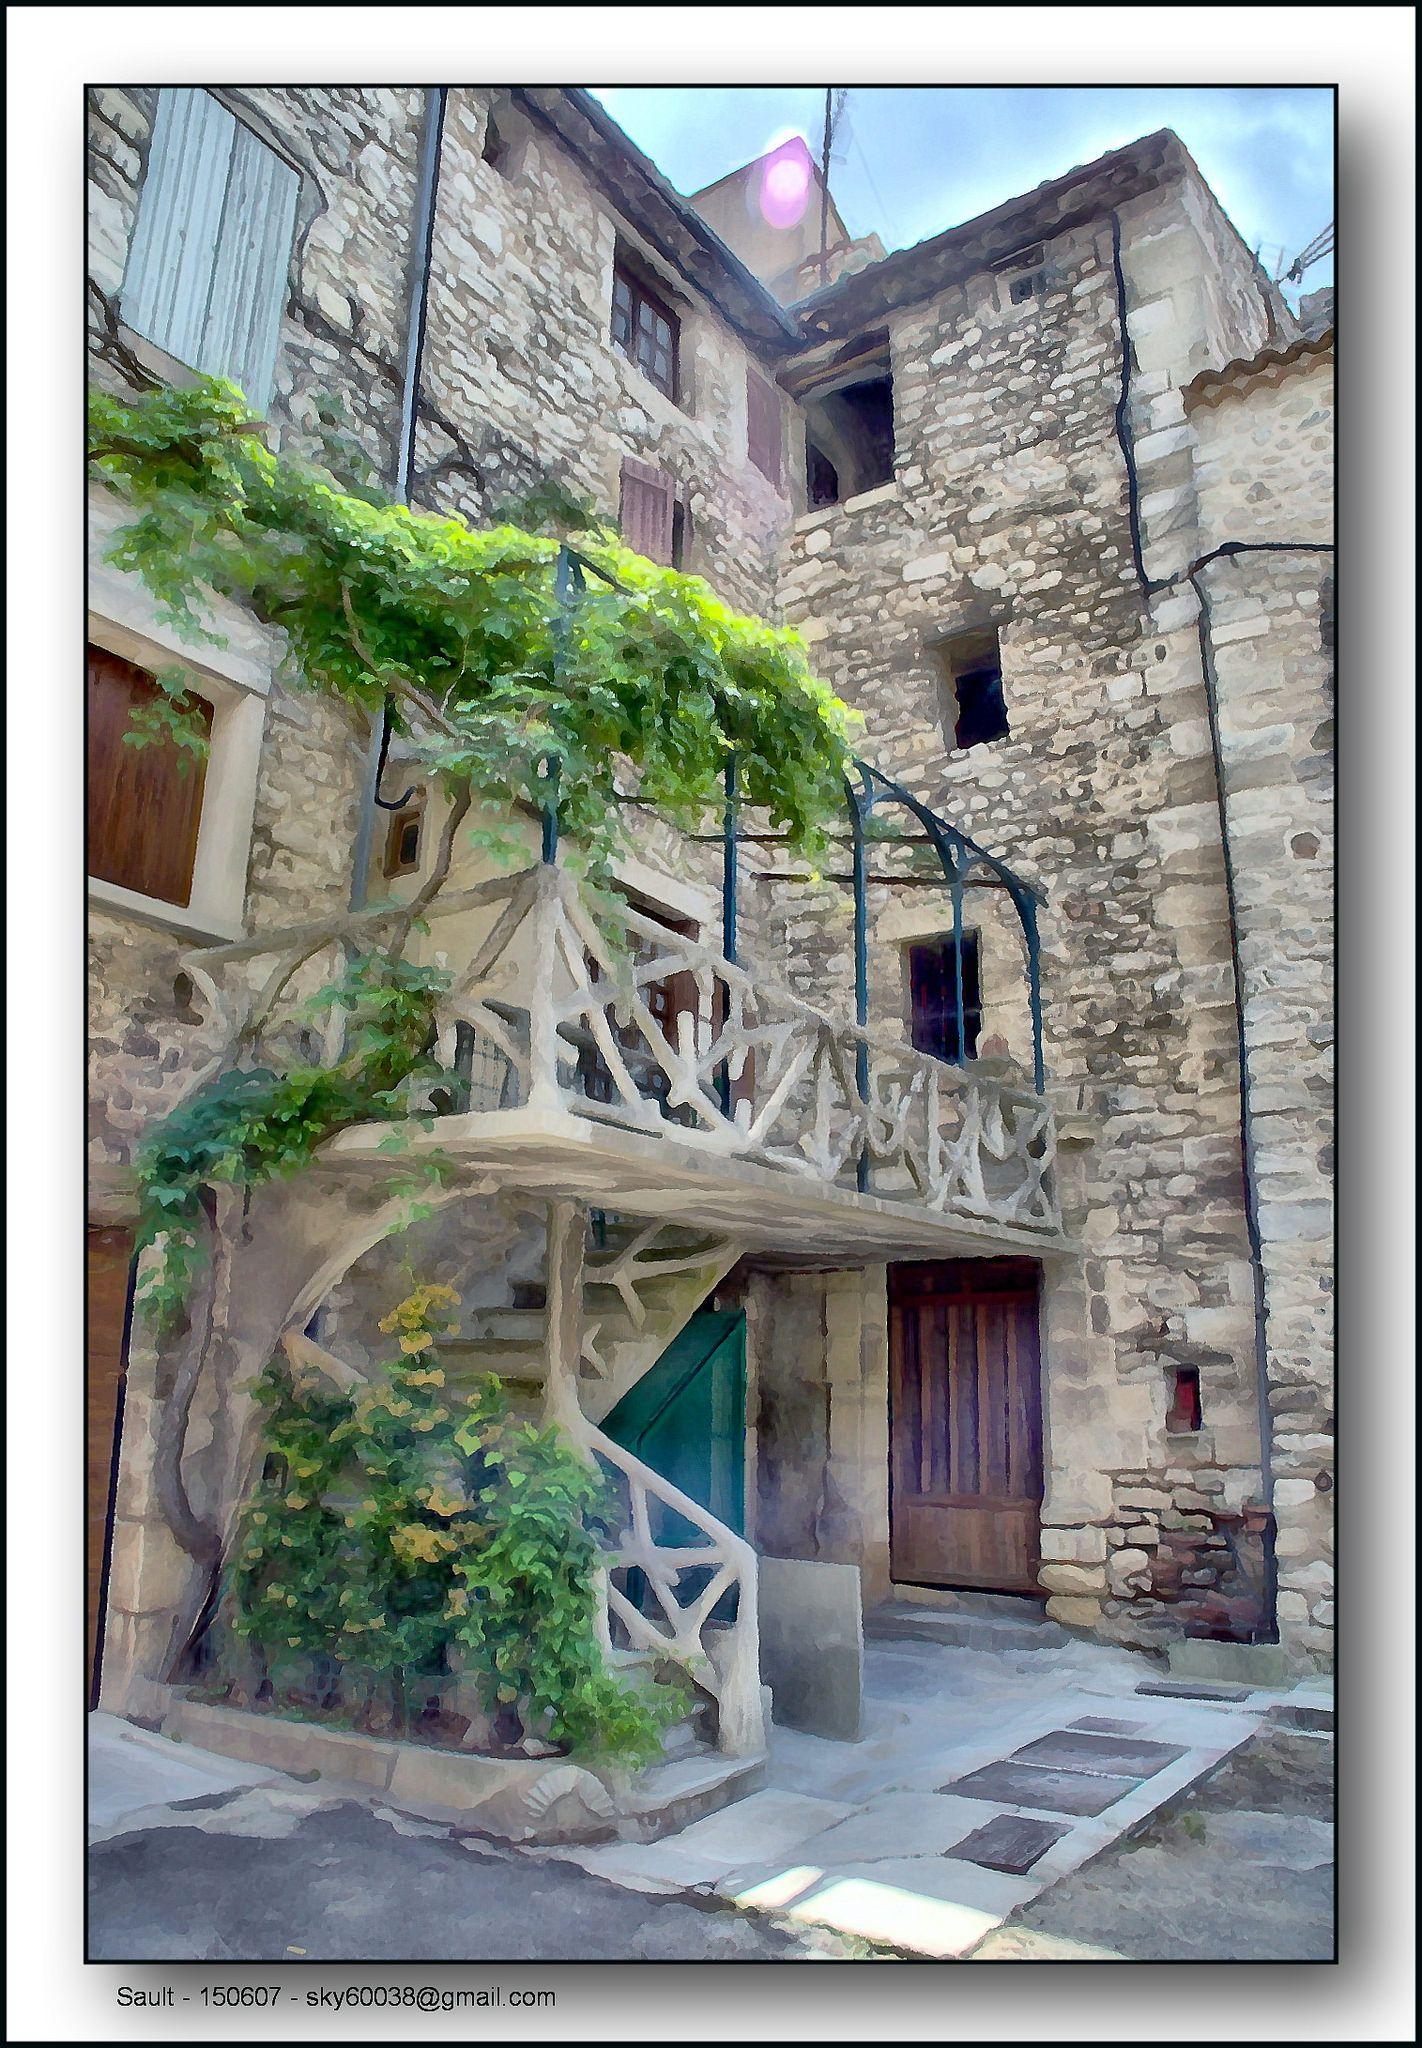 https://flic.kr/p/wUsDQv | France, Vaucluse | Sault